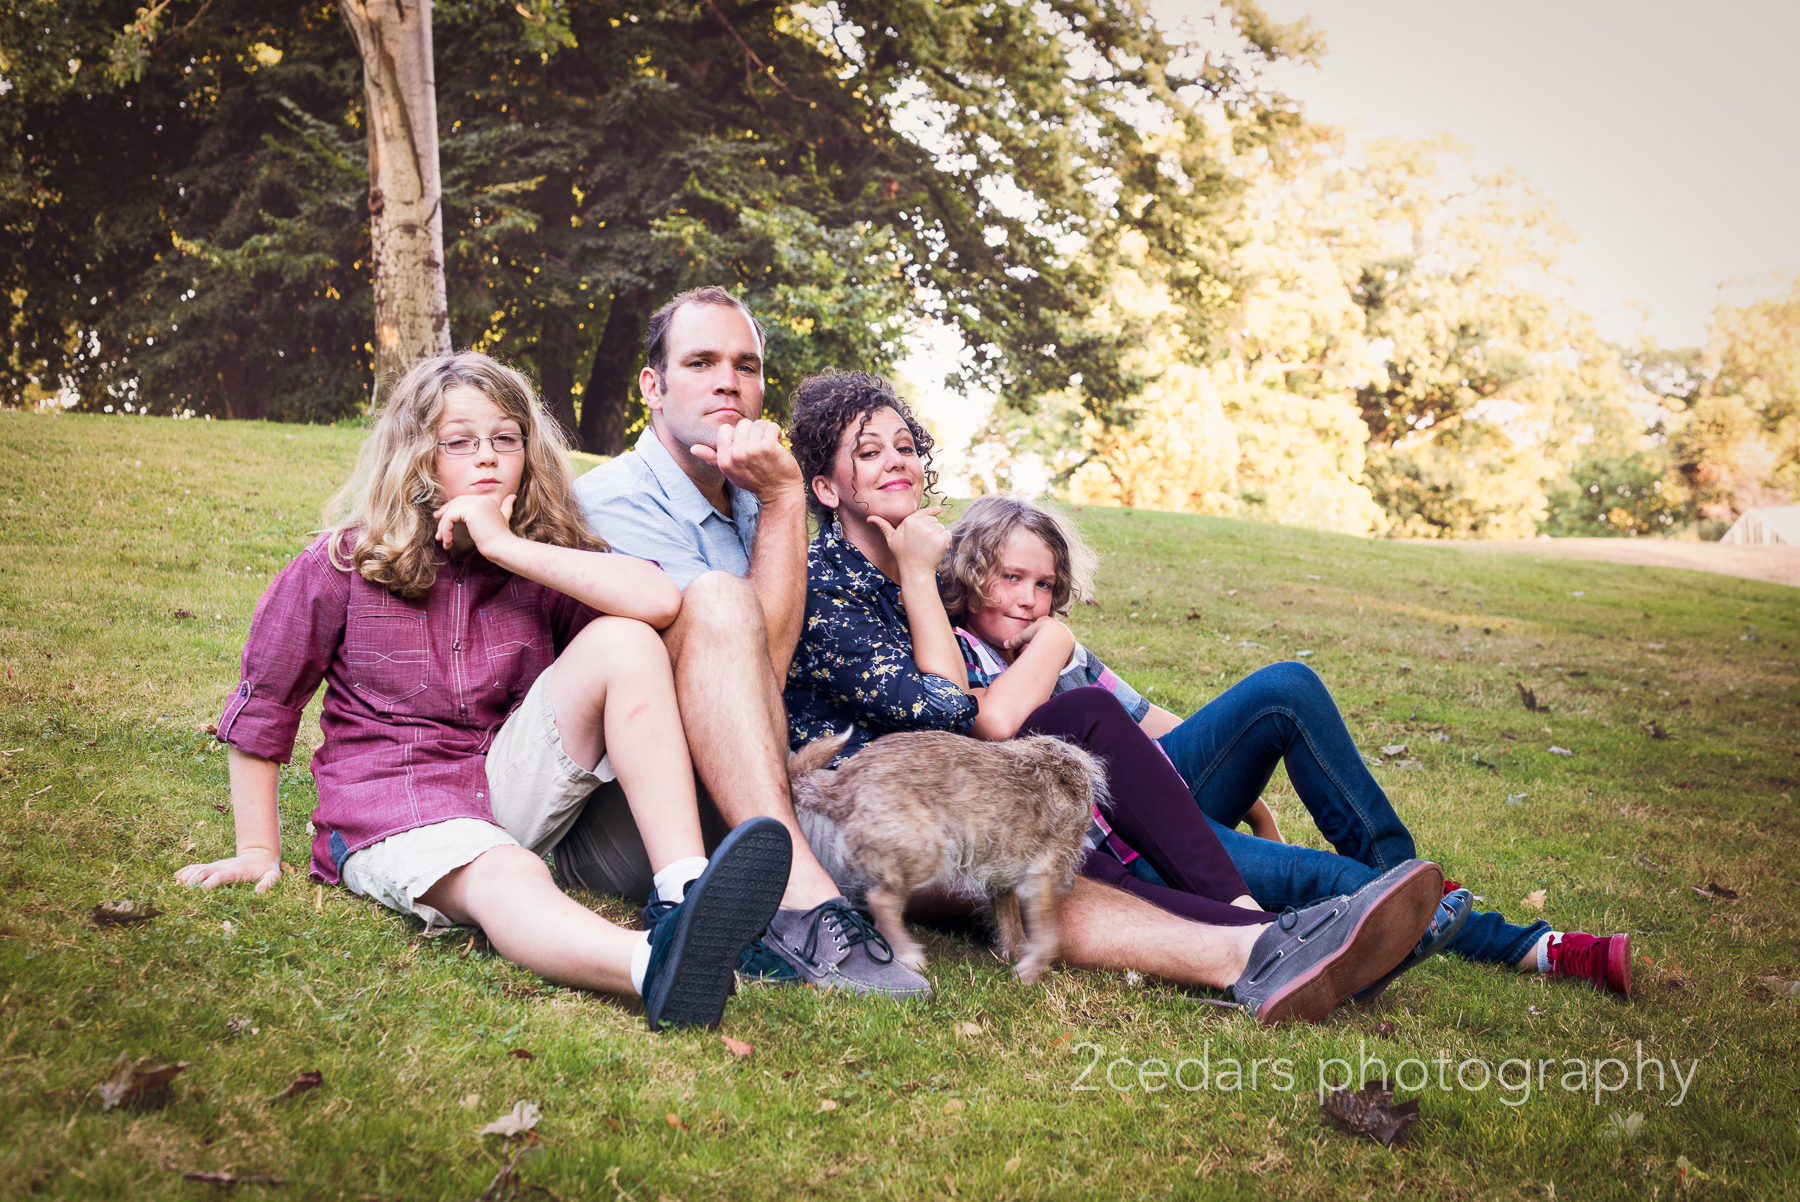 2cedarsphoto-Sullivan-Family-Web--7.jpg